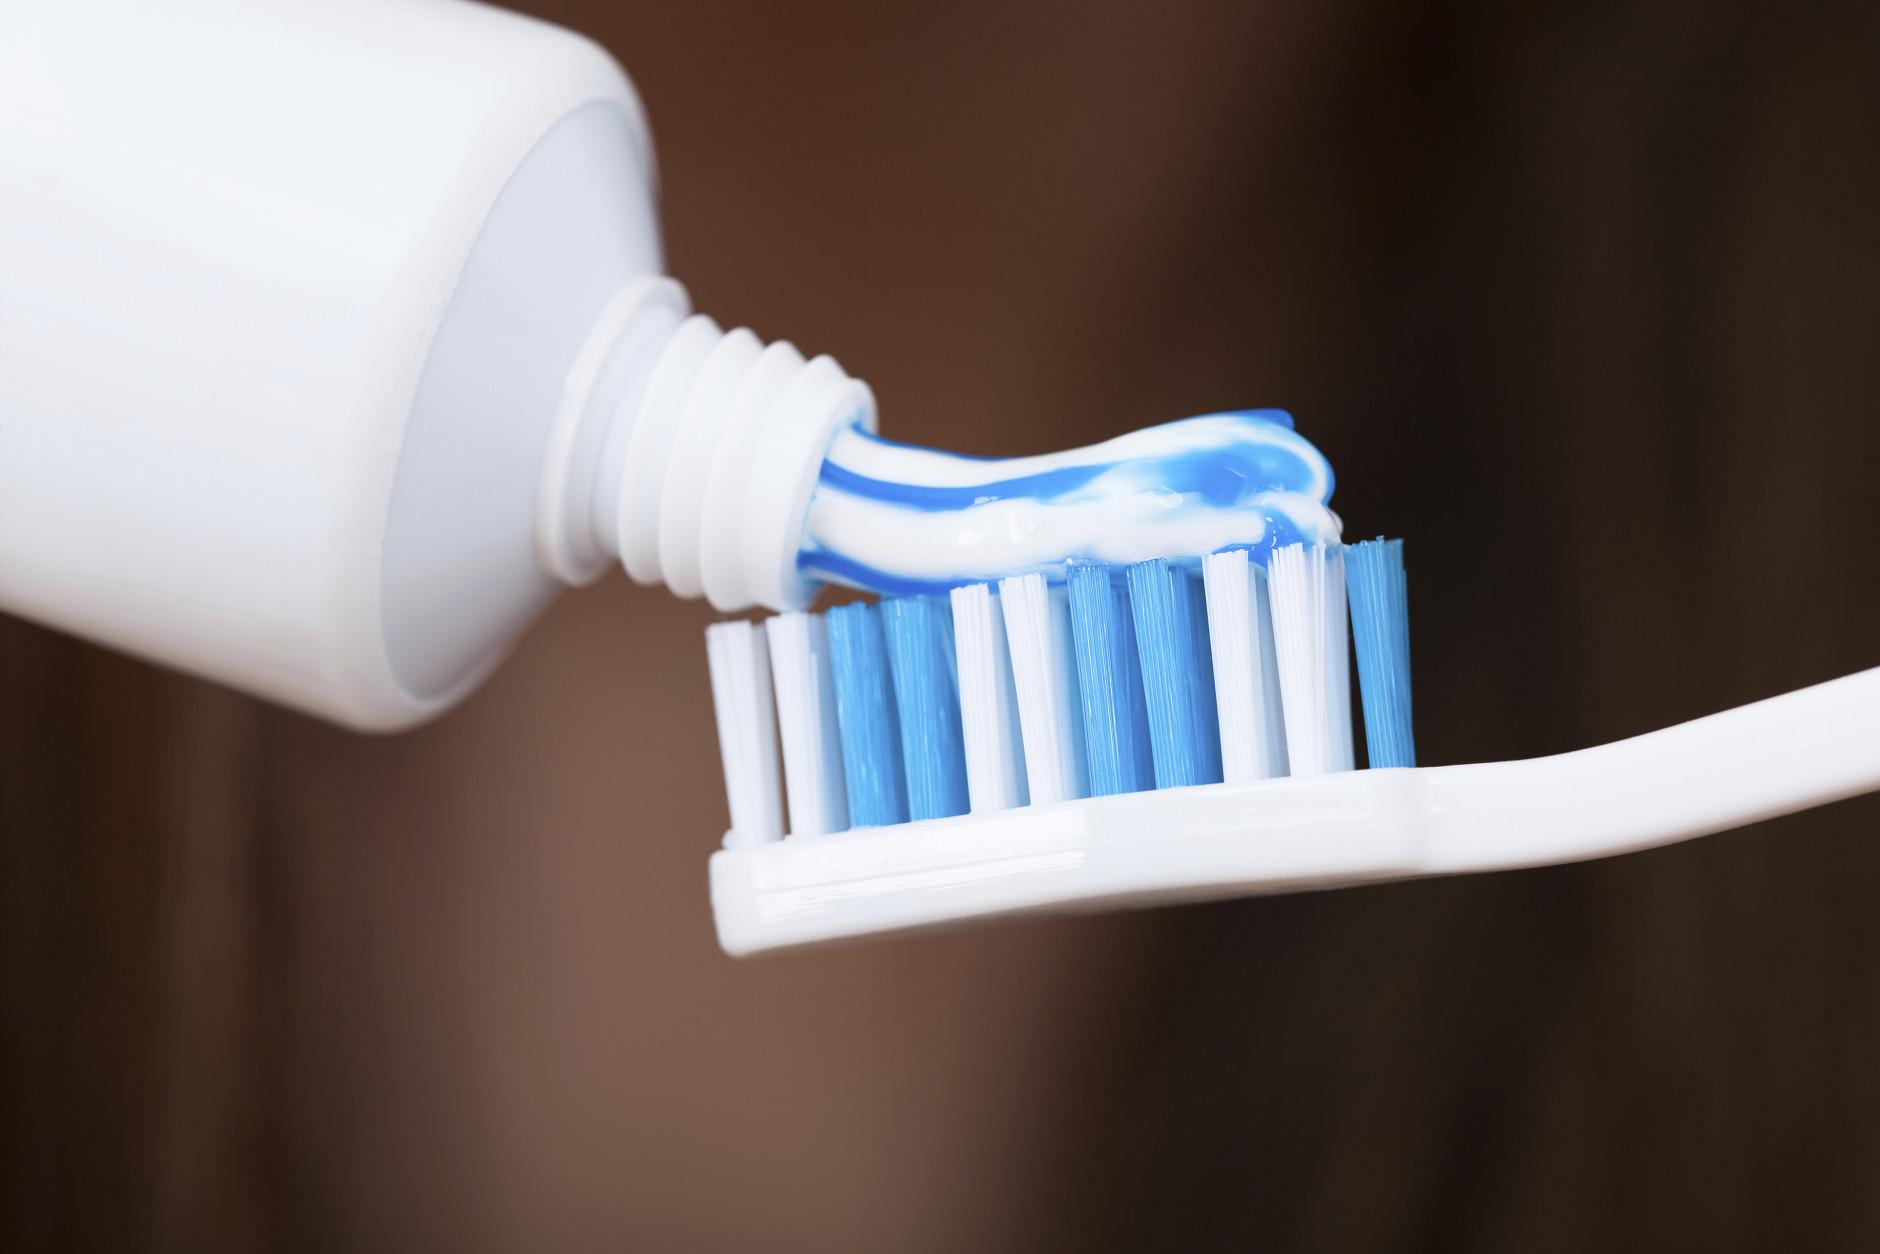 Adding Toothpaste On Brush